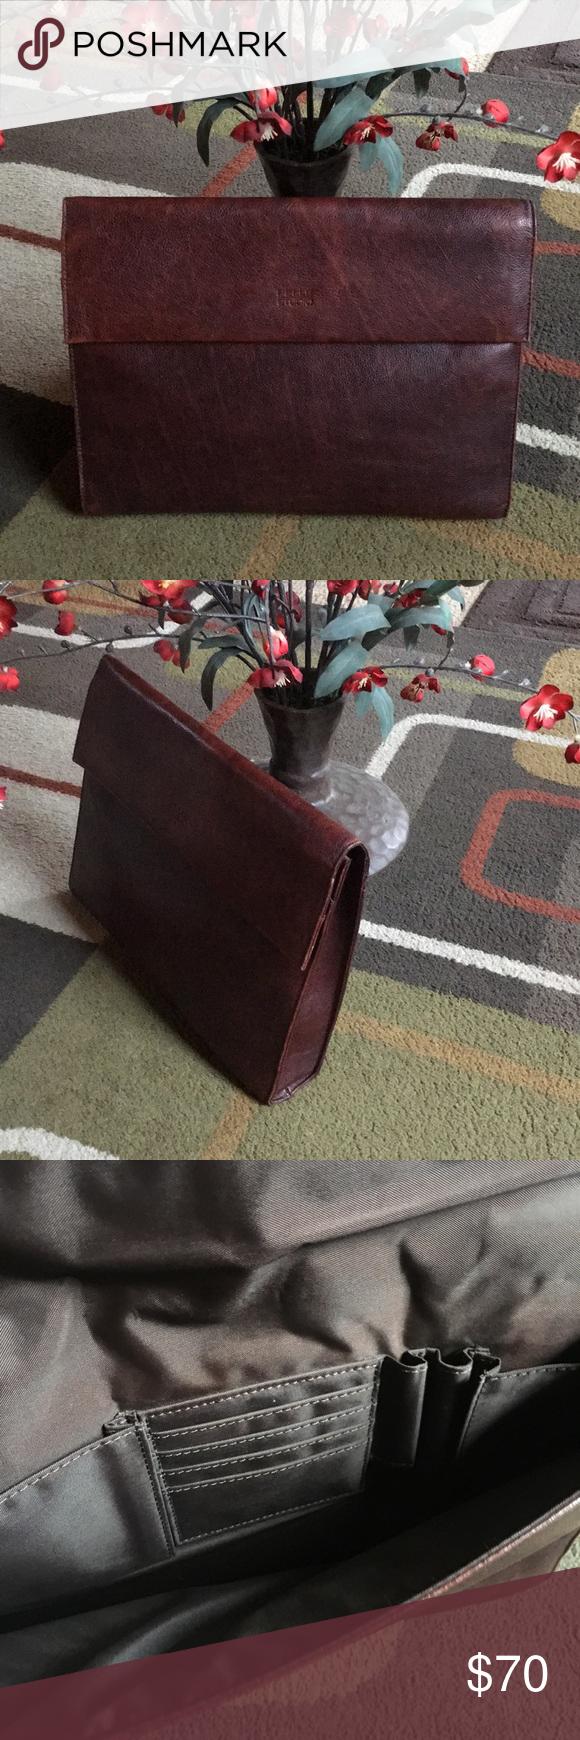 Vintage Wilson Leather Pelle Studio briefcase🌺 Vintage